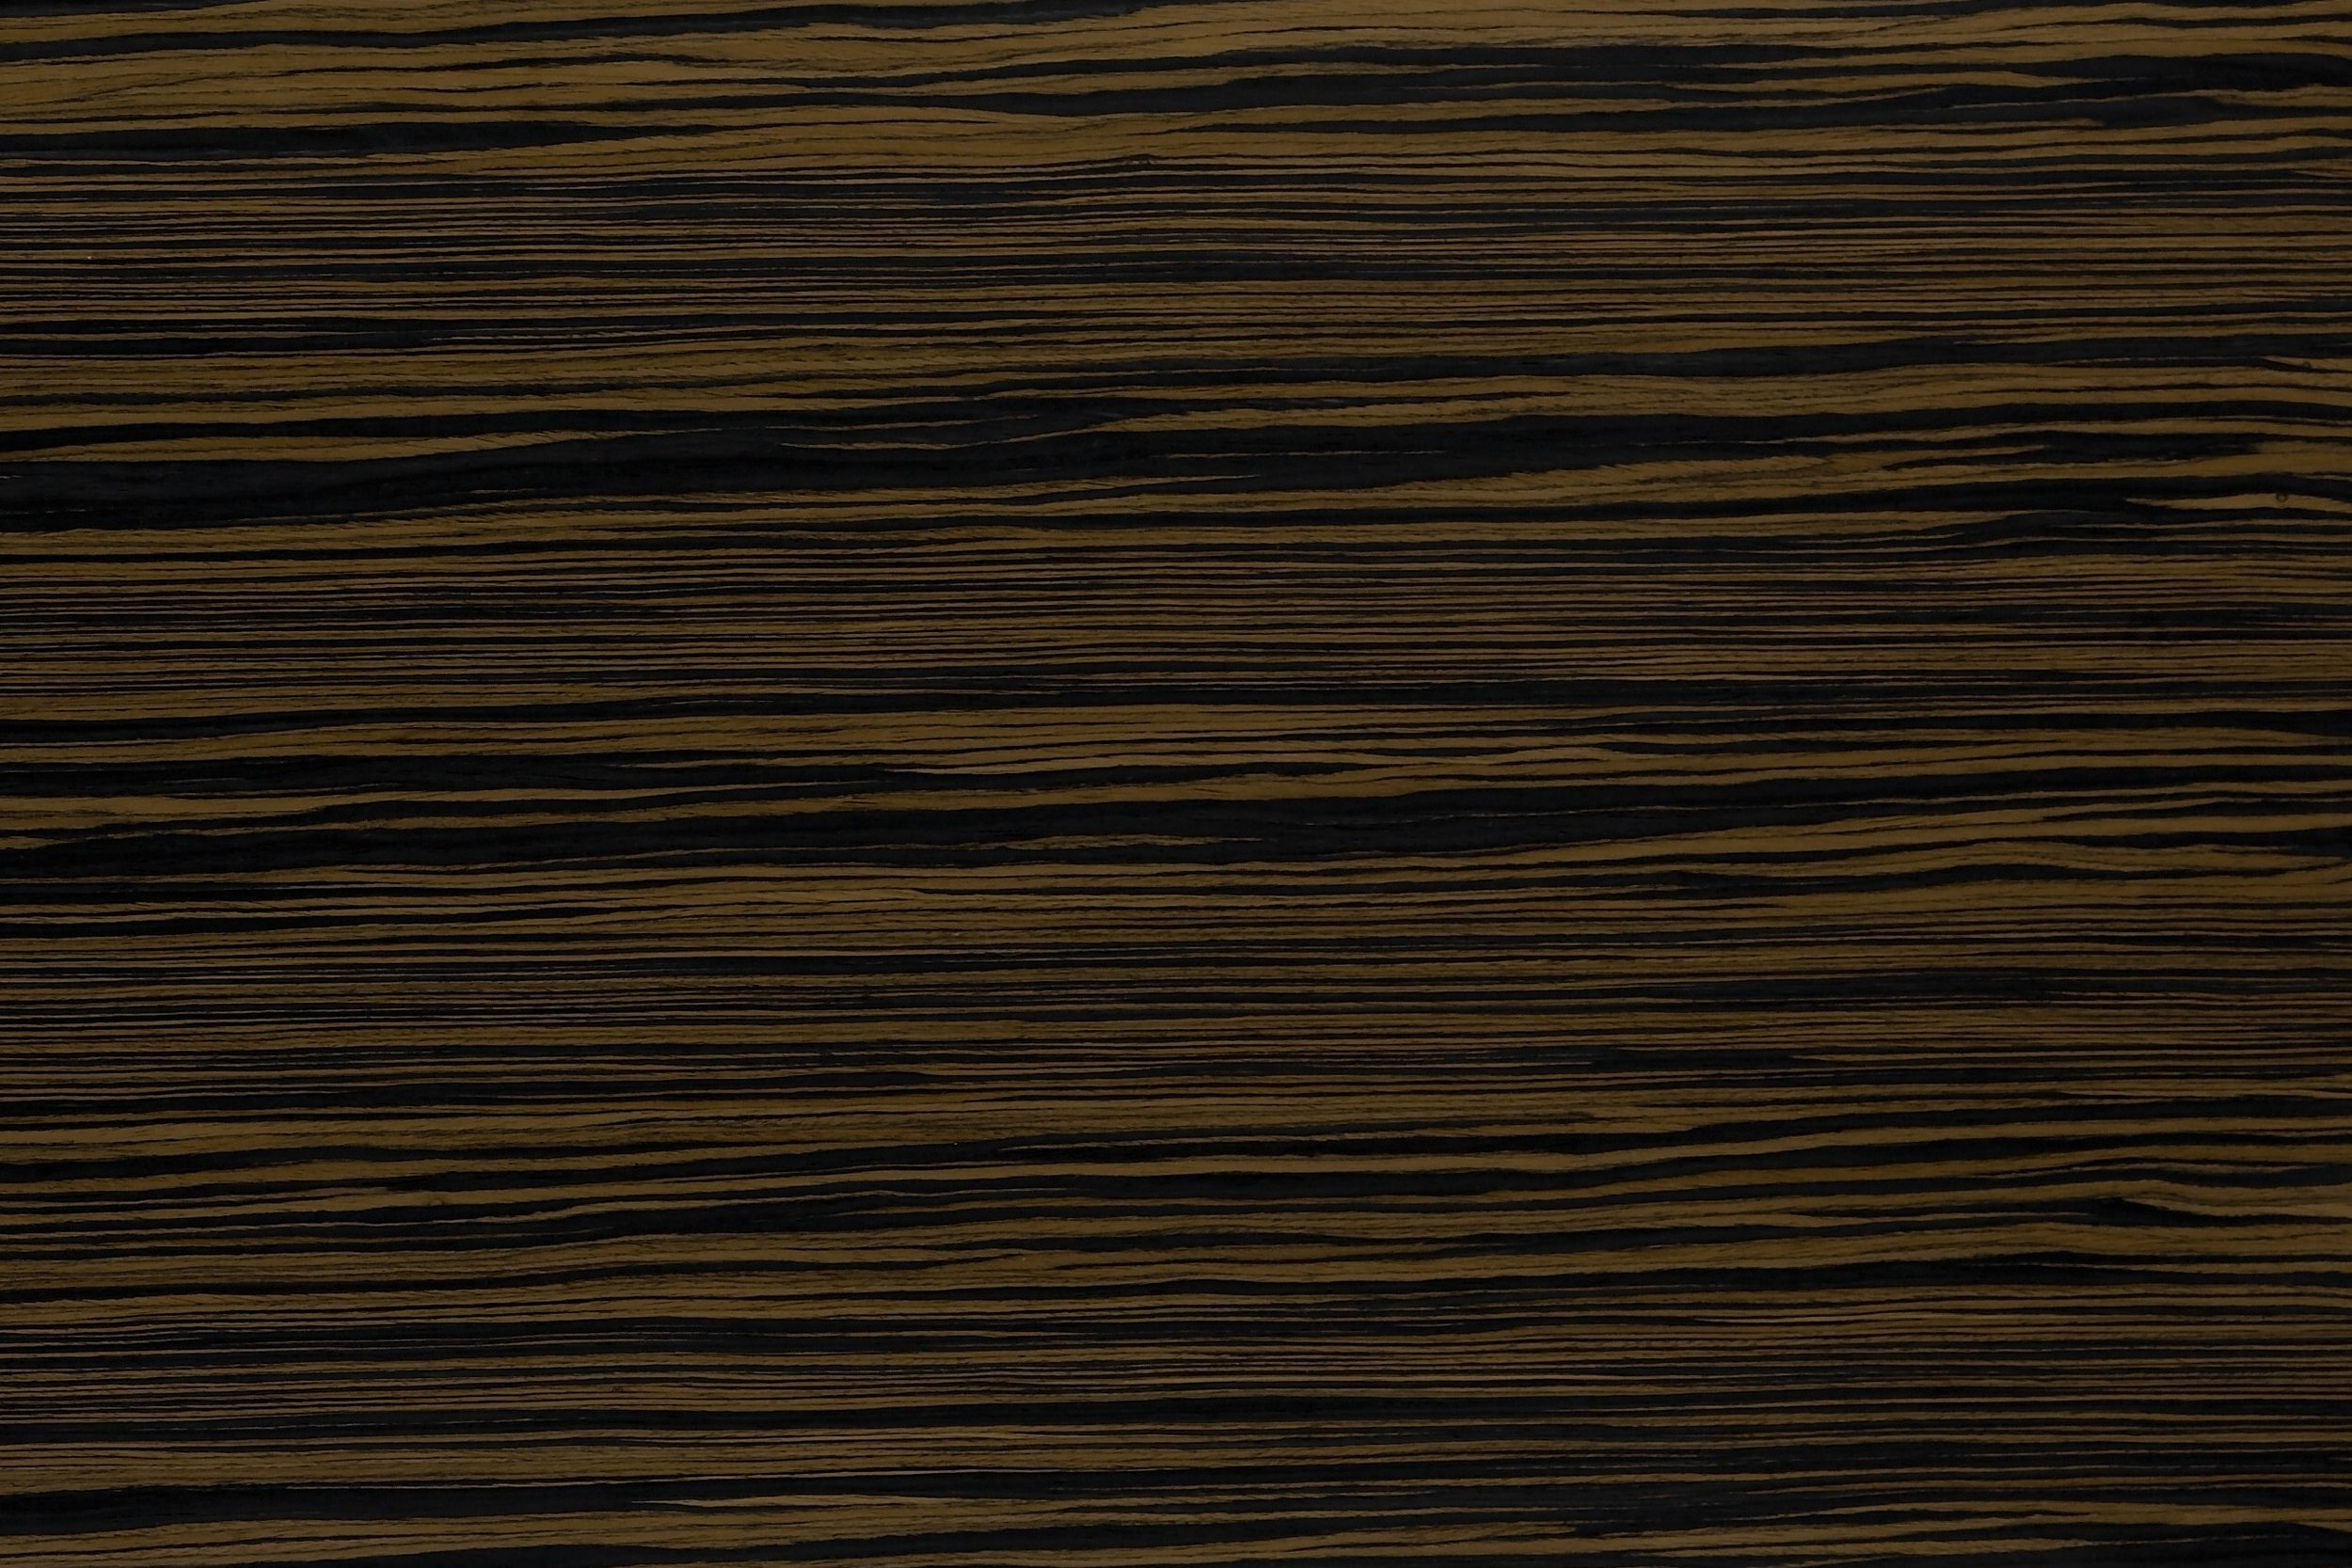 Item+Ebony+2E+42+%28250x60cm%29+no+tiling.jpg